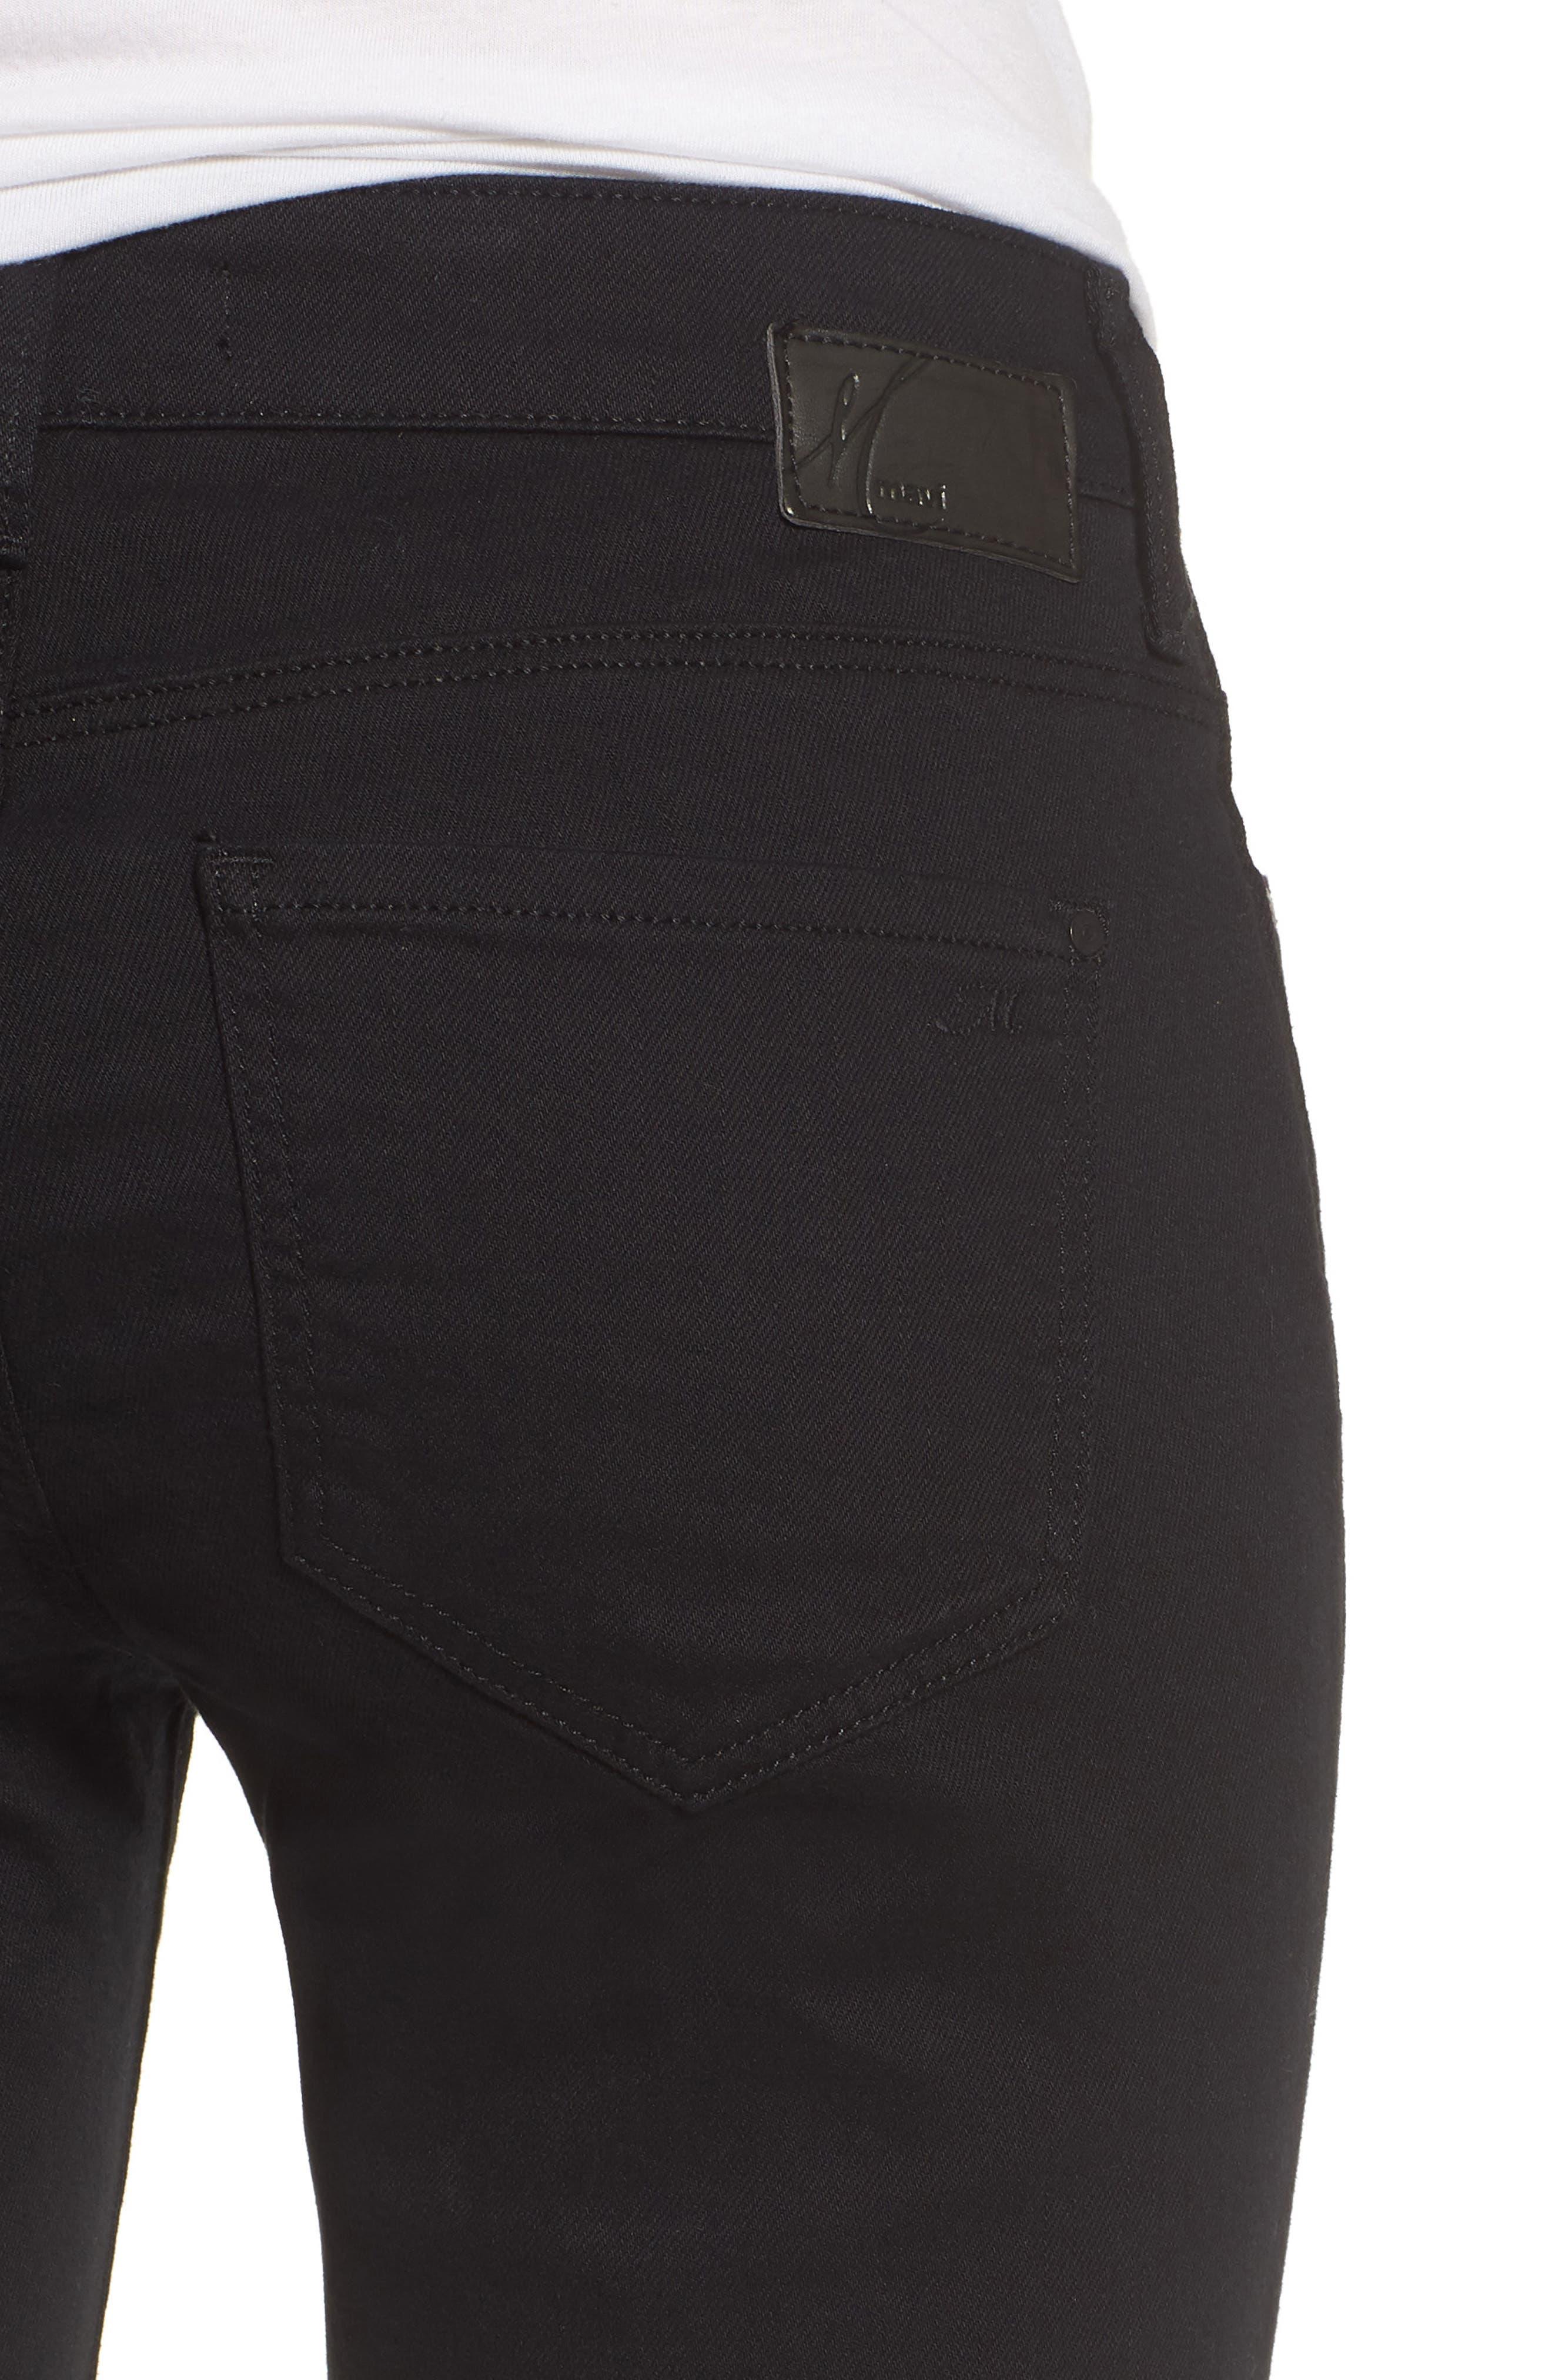 Karly Black Nolita Roll Cuff Bermuda Shorts,                             Alternate thumbnail 4, color,